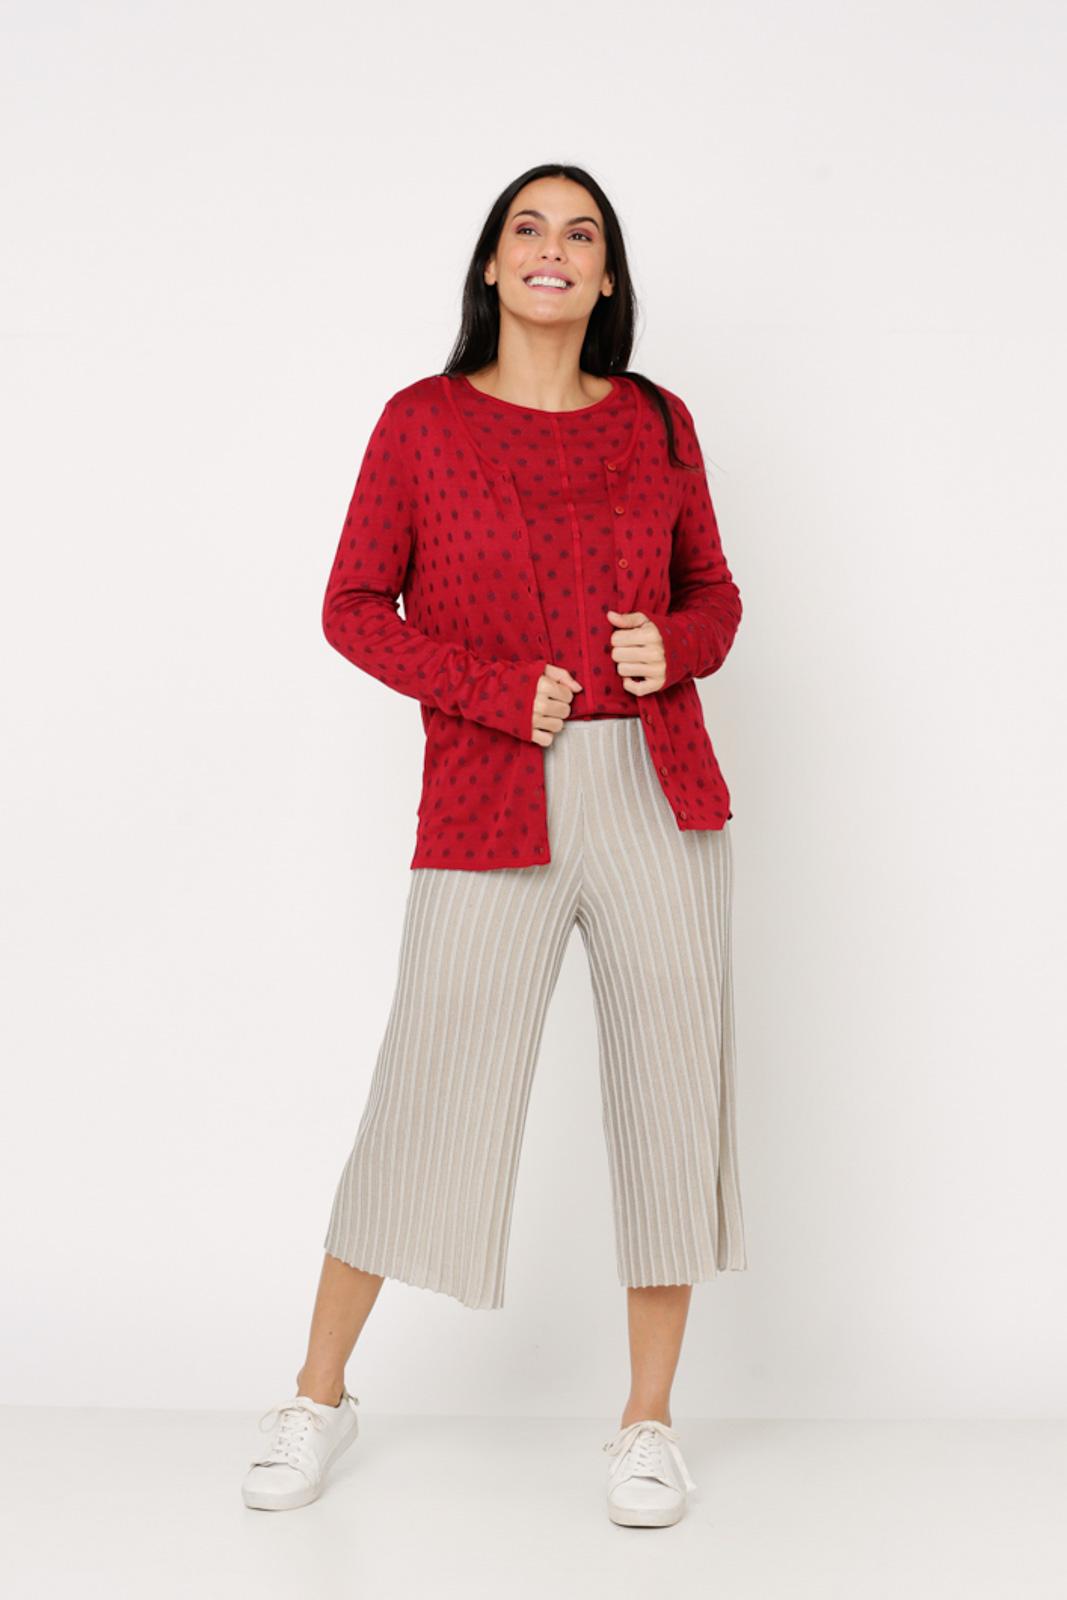 Conjunto de tricot Ralm twinset poás - Vermelho